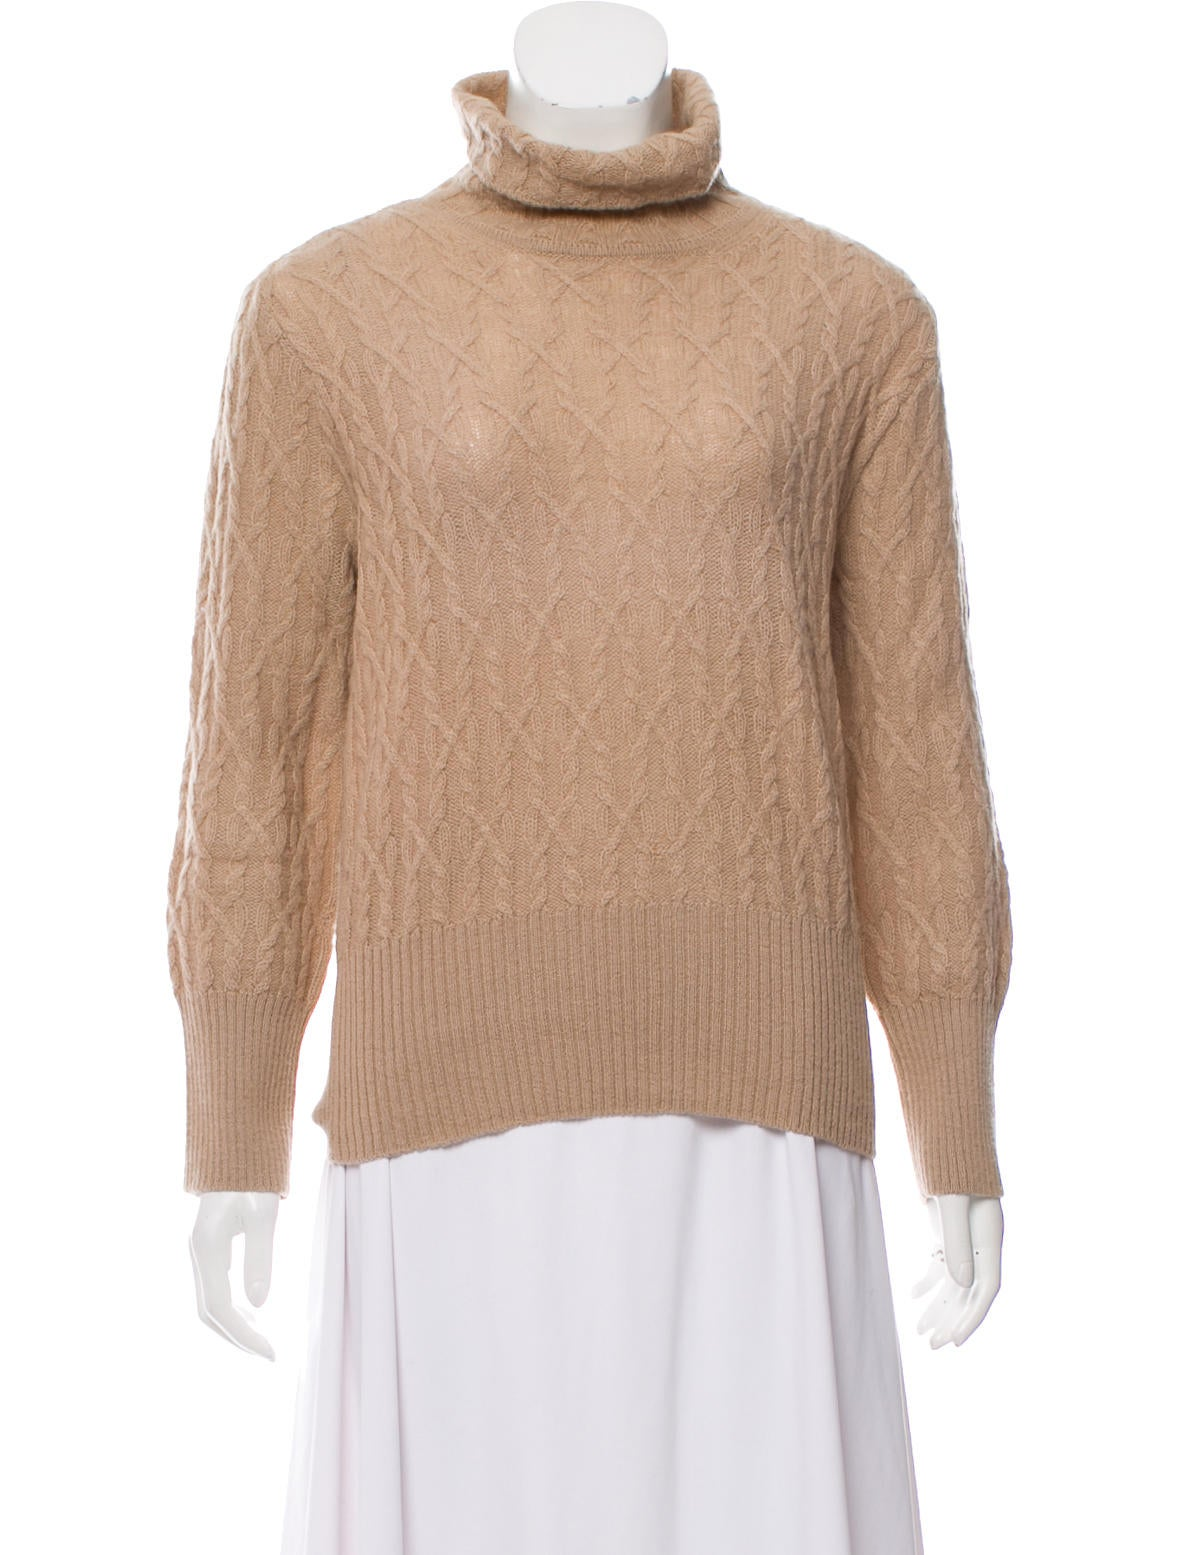 f1827061e749 Escada Sport Baby Alpaca Turtleneck - Clothing - WES20590